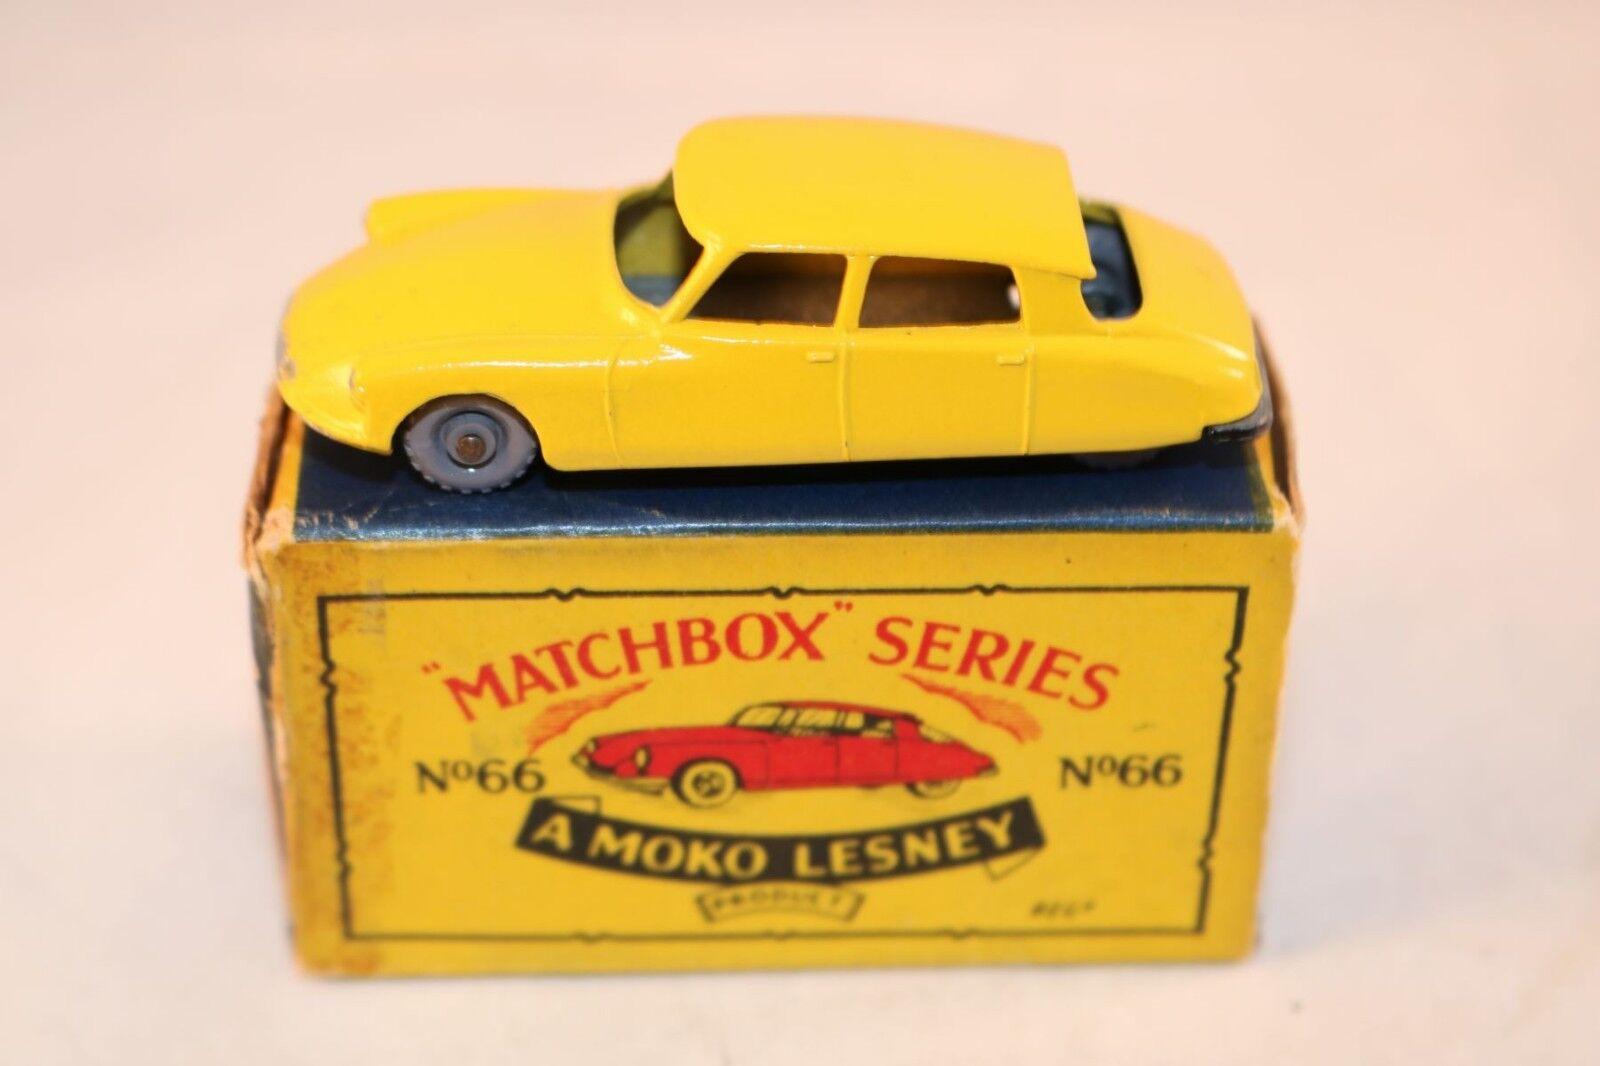 Matchbox A Moko Lesney No 66 Citroen DS 19 GPW very near mint in box